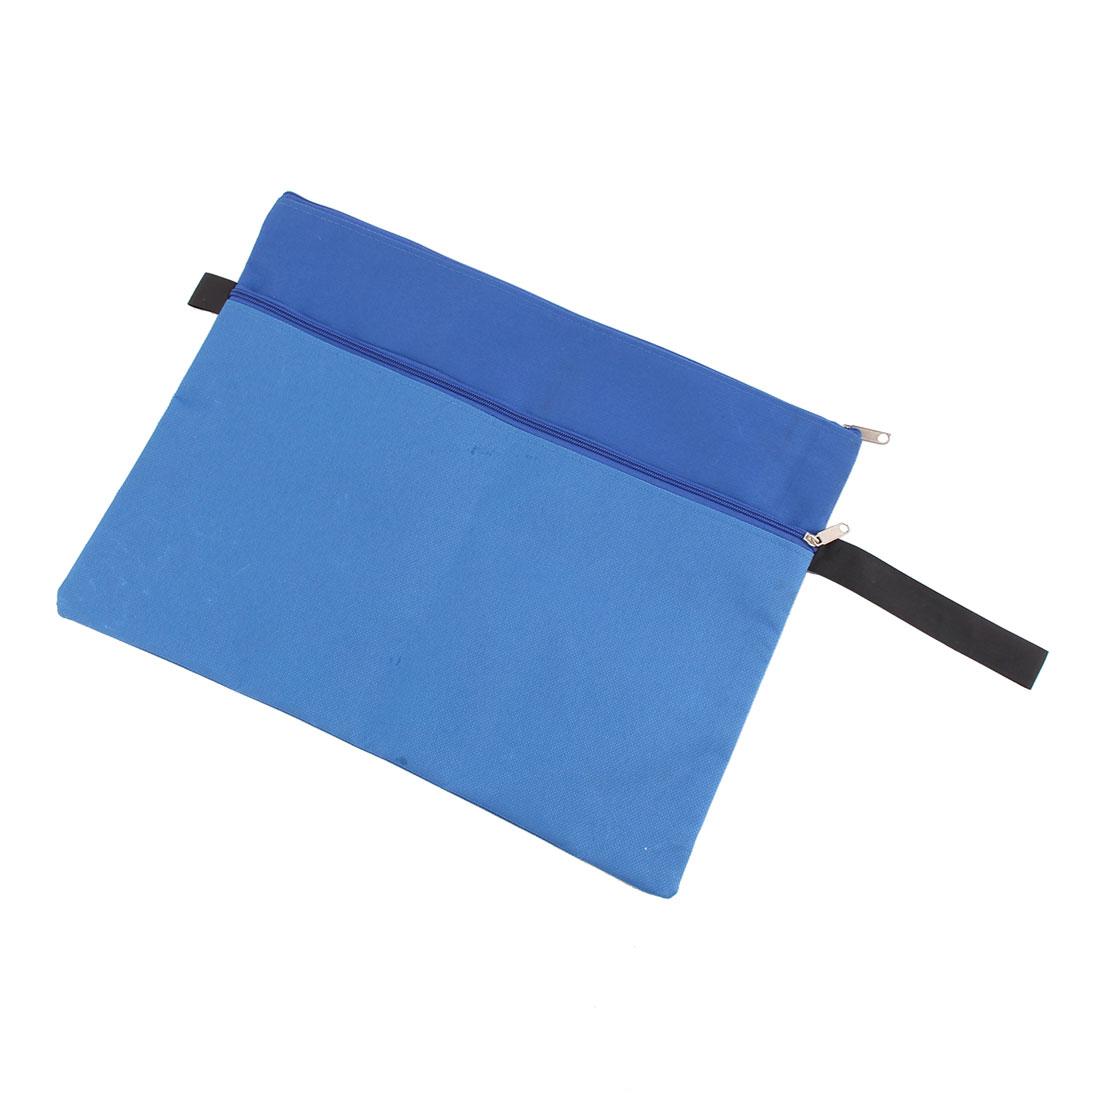 Office Zipper Closure A4 Paper Document File Bag Folder Holder Pouch Blue